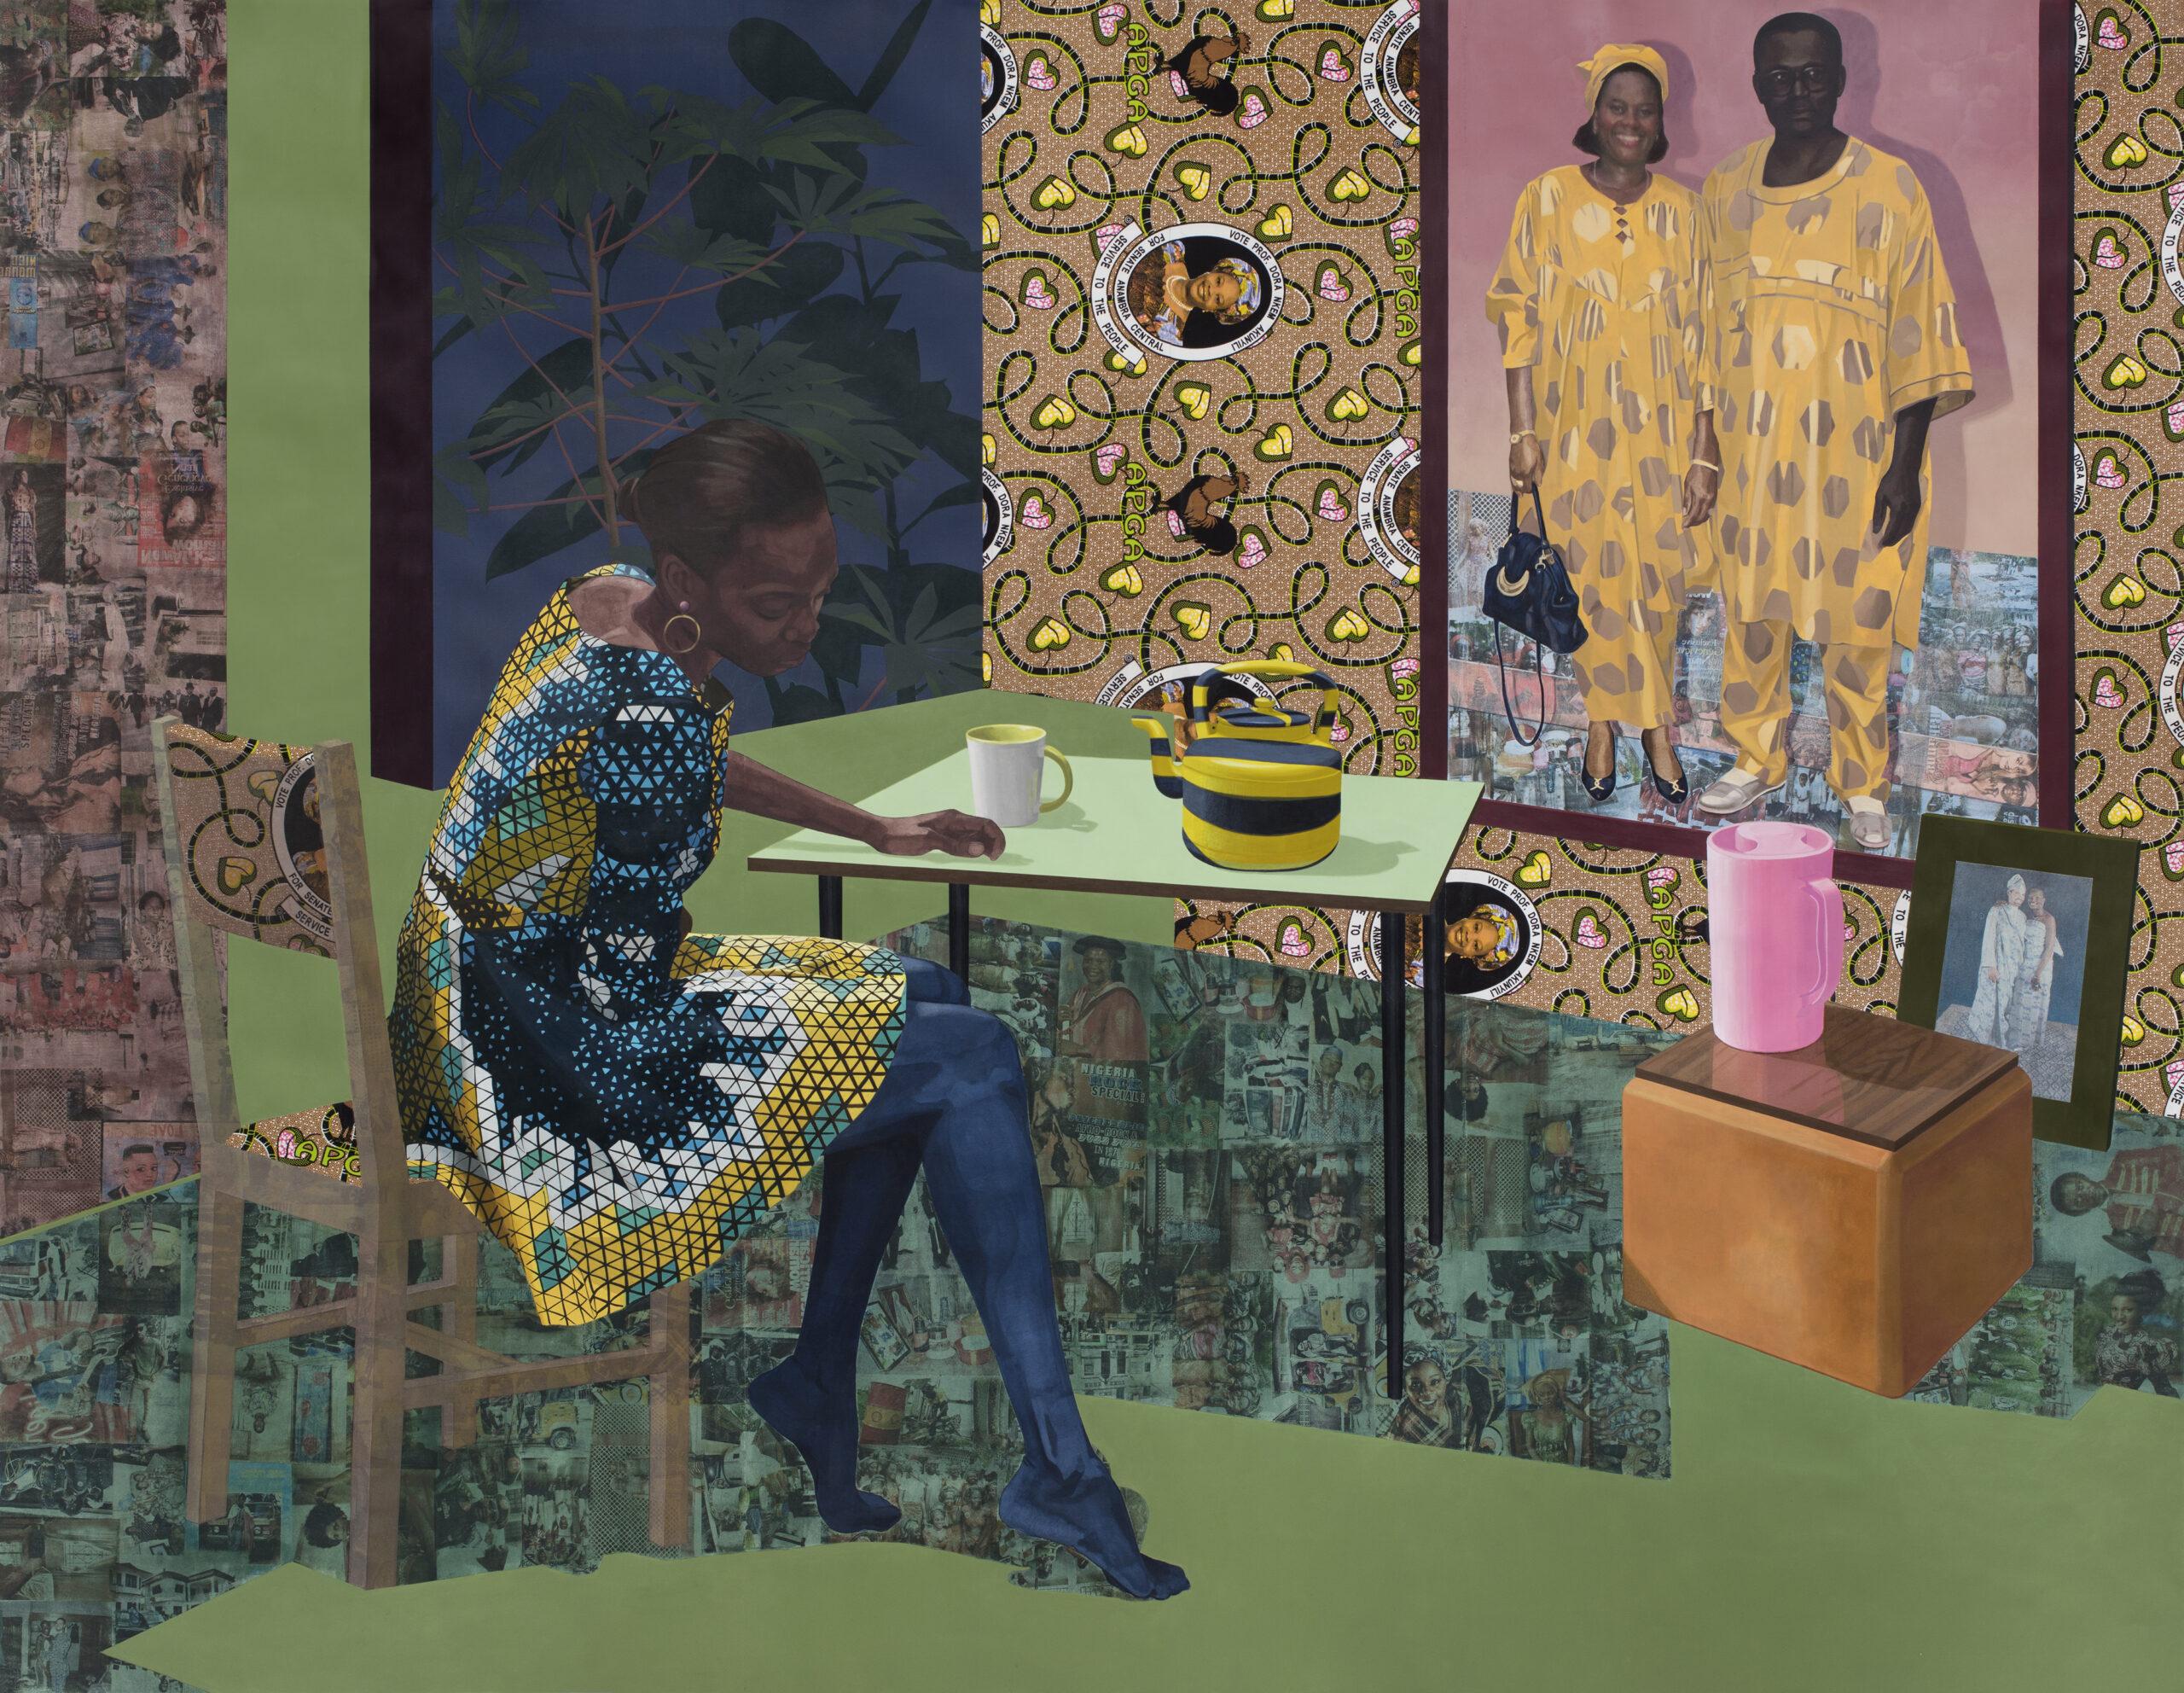 Njideka Akunyili Crosby. Dwell: Aso Ebi. 2017.  Courtesy the artist and Victoria Miro, London (photography Brian Forrest) © Njideka Akunyili Crosby.